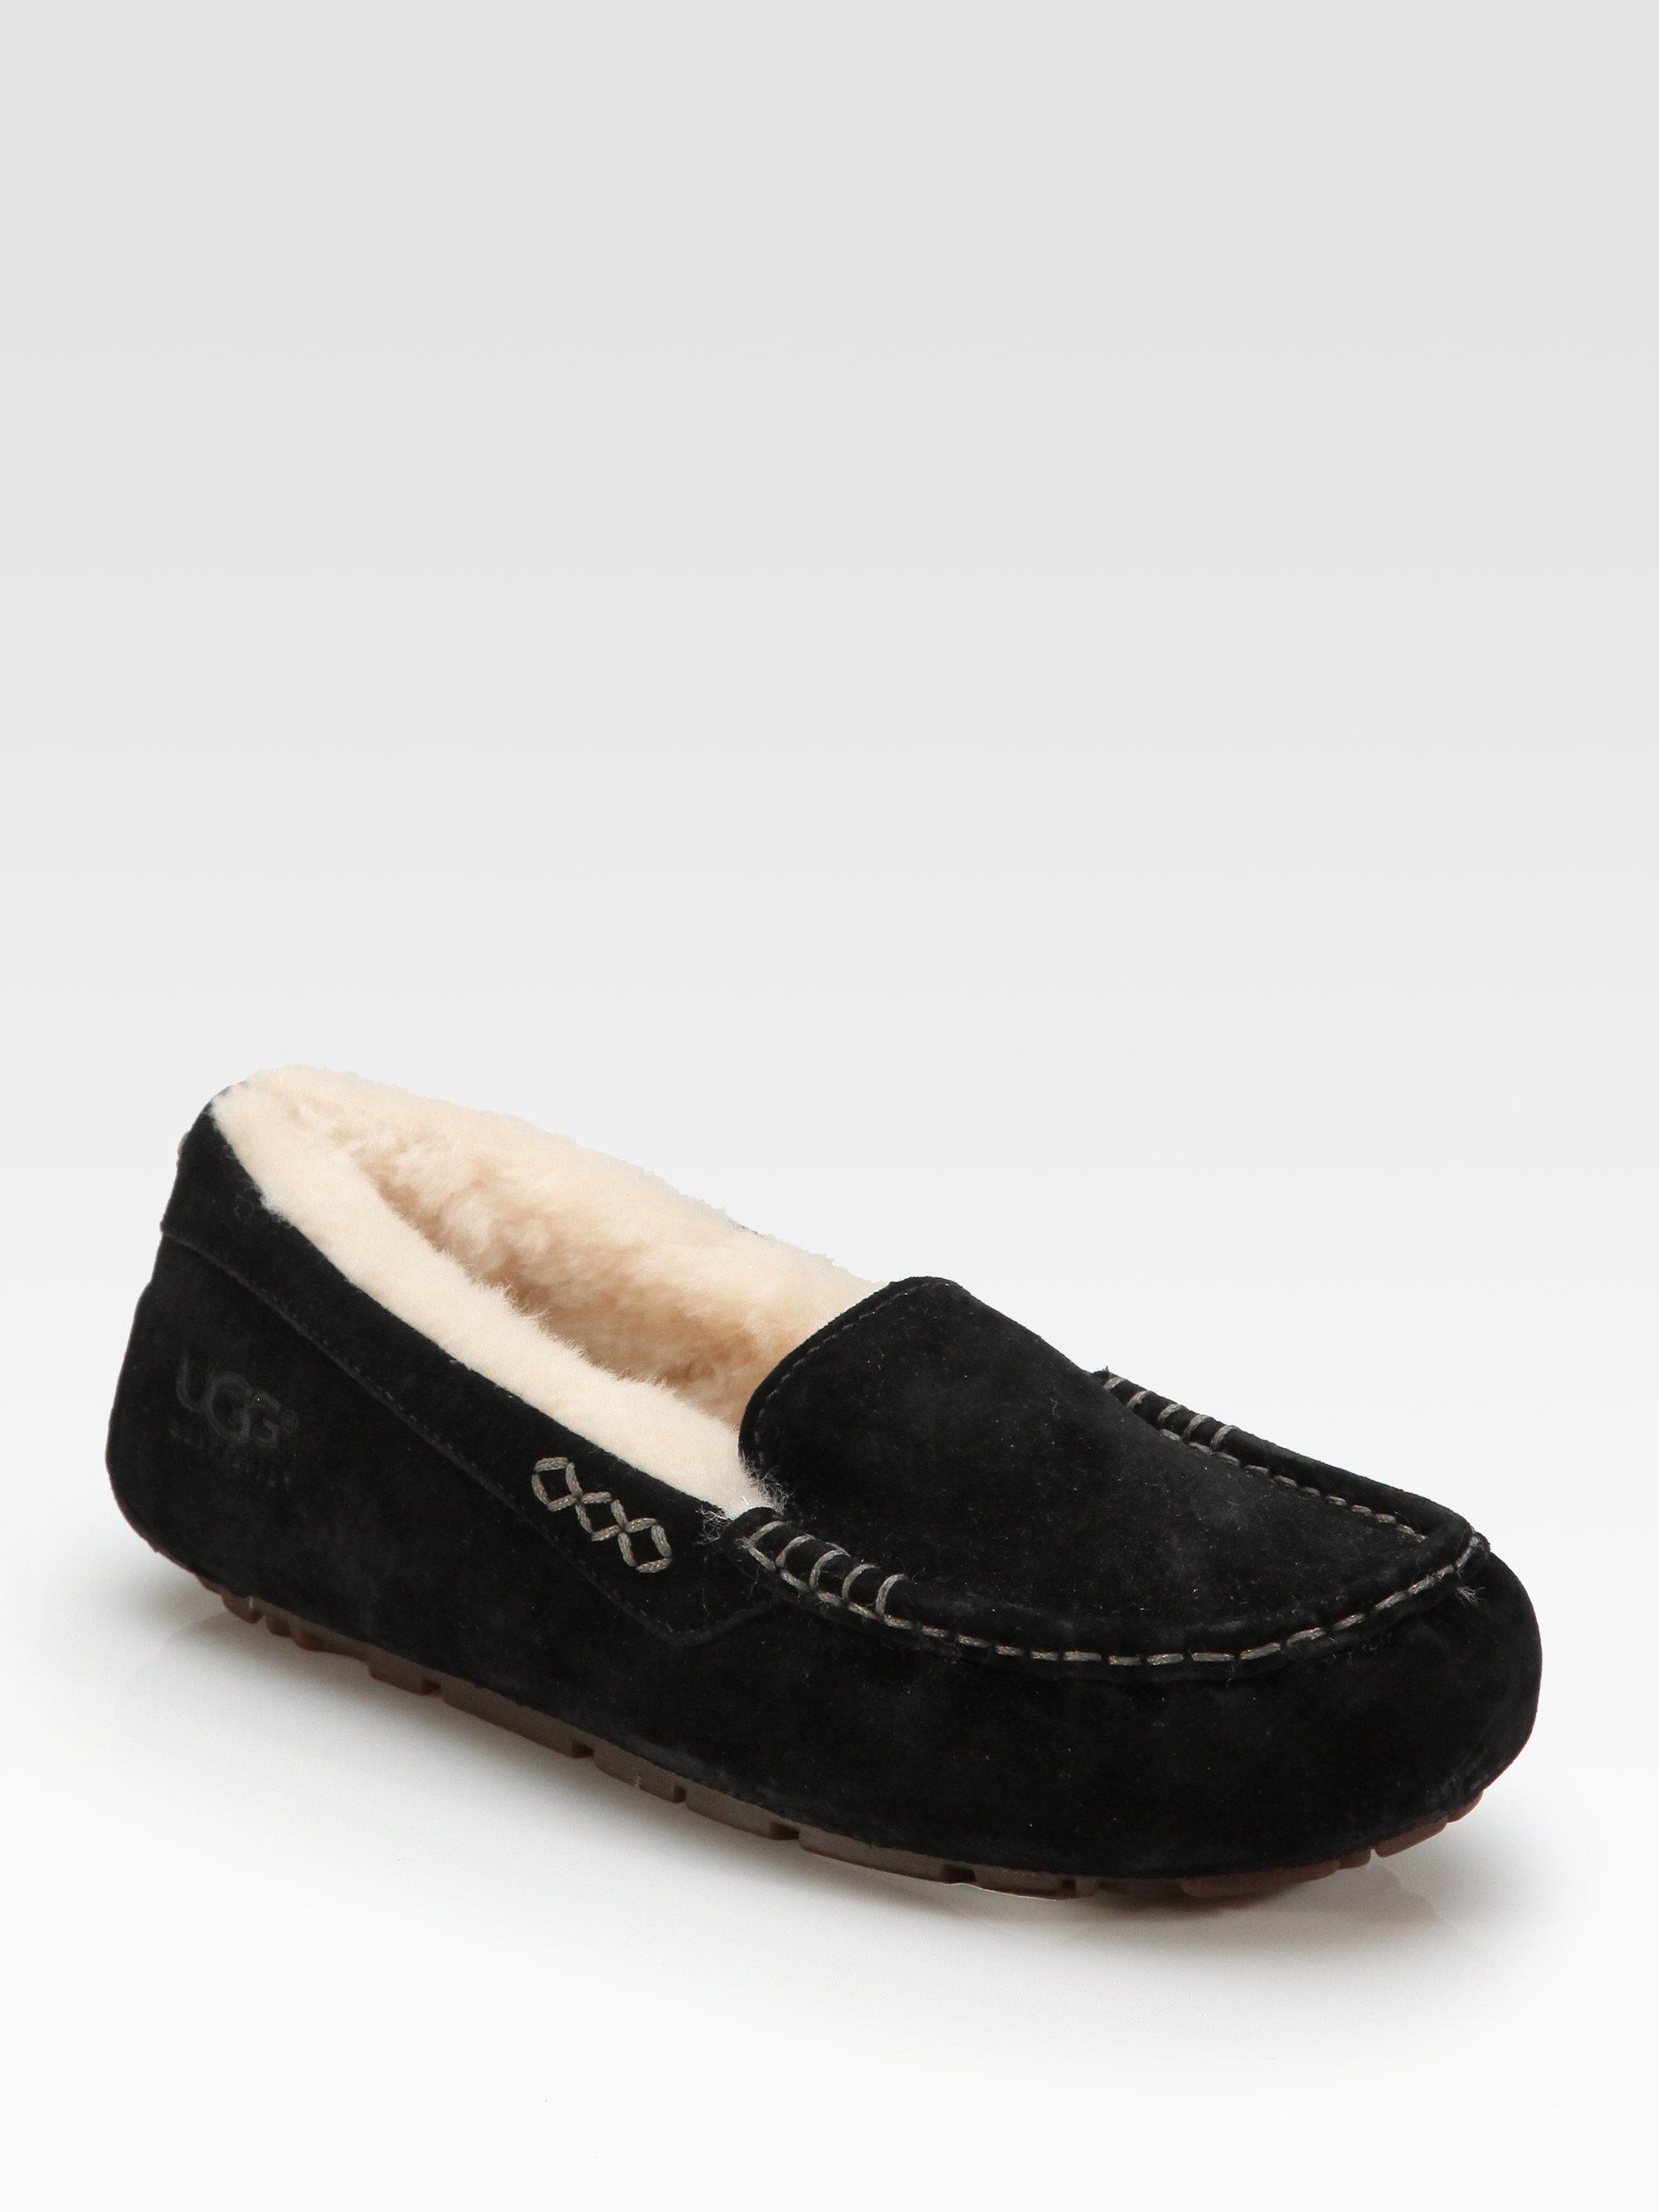 ugg australia ansley slipper